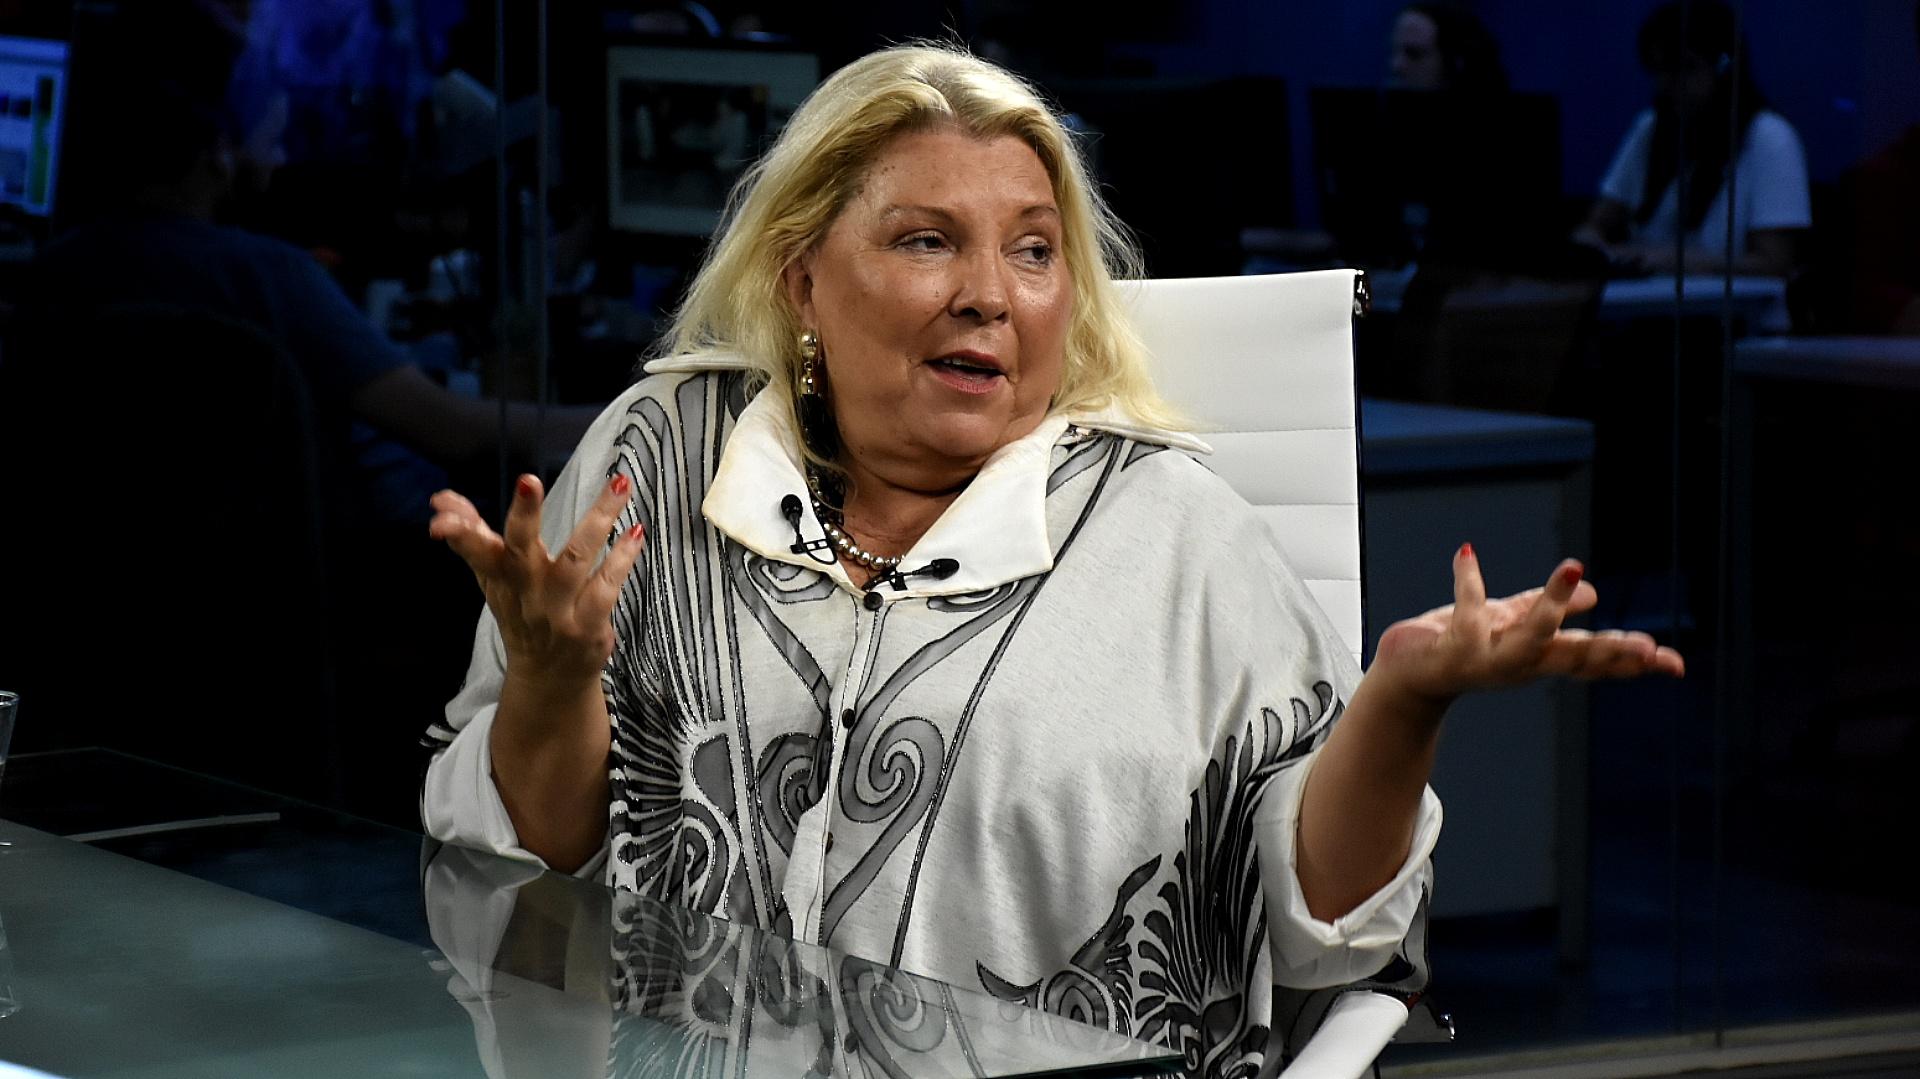 La diputada Elisa Carrió fue acusada por el dirigente K Eduardo Valdés(Nicolás Stulberg)